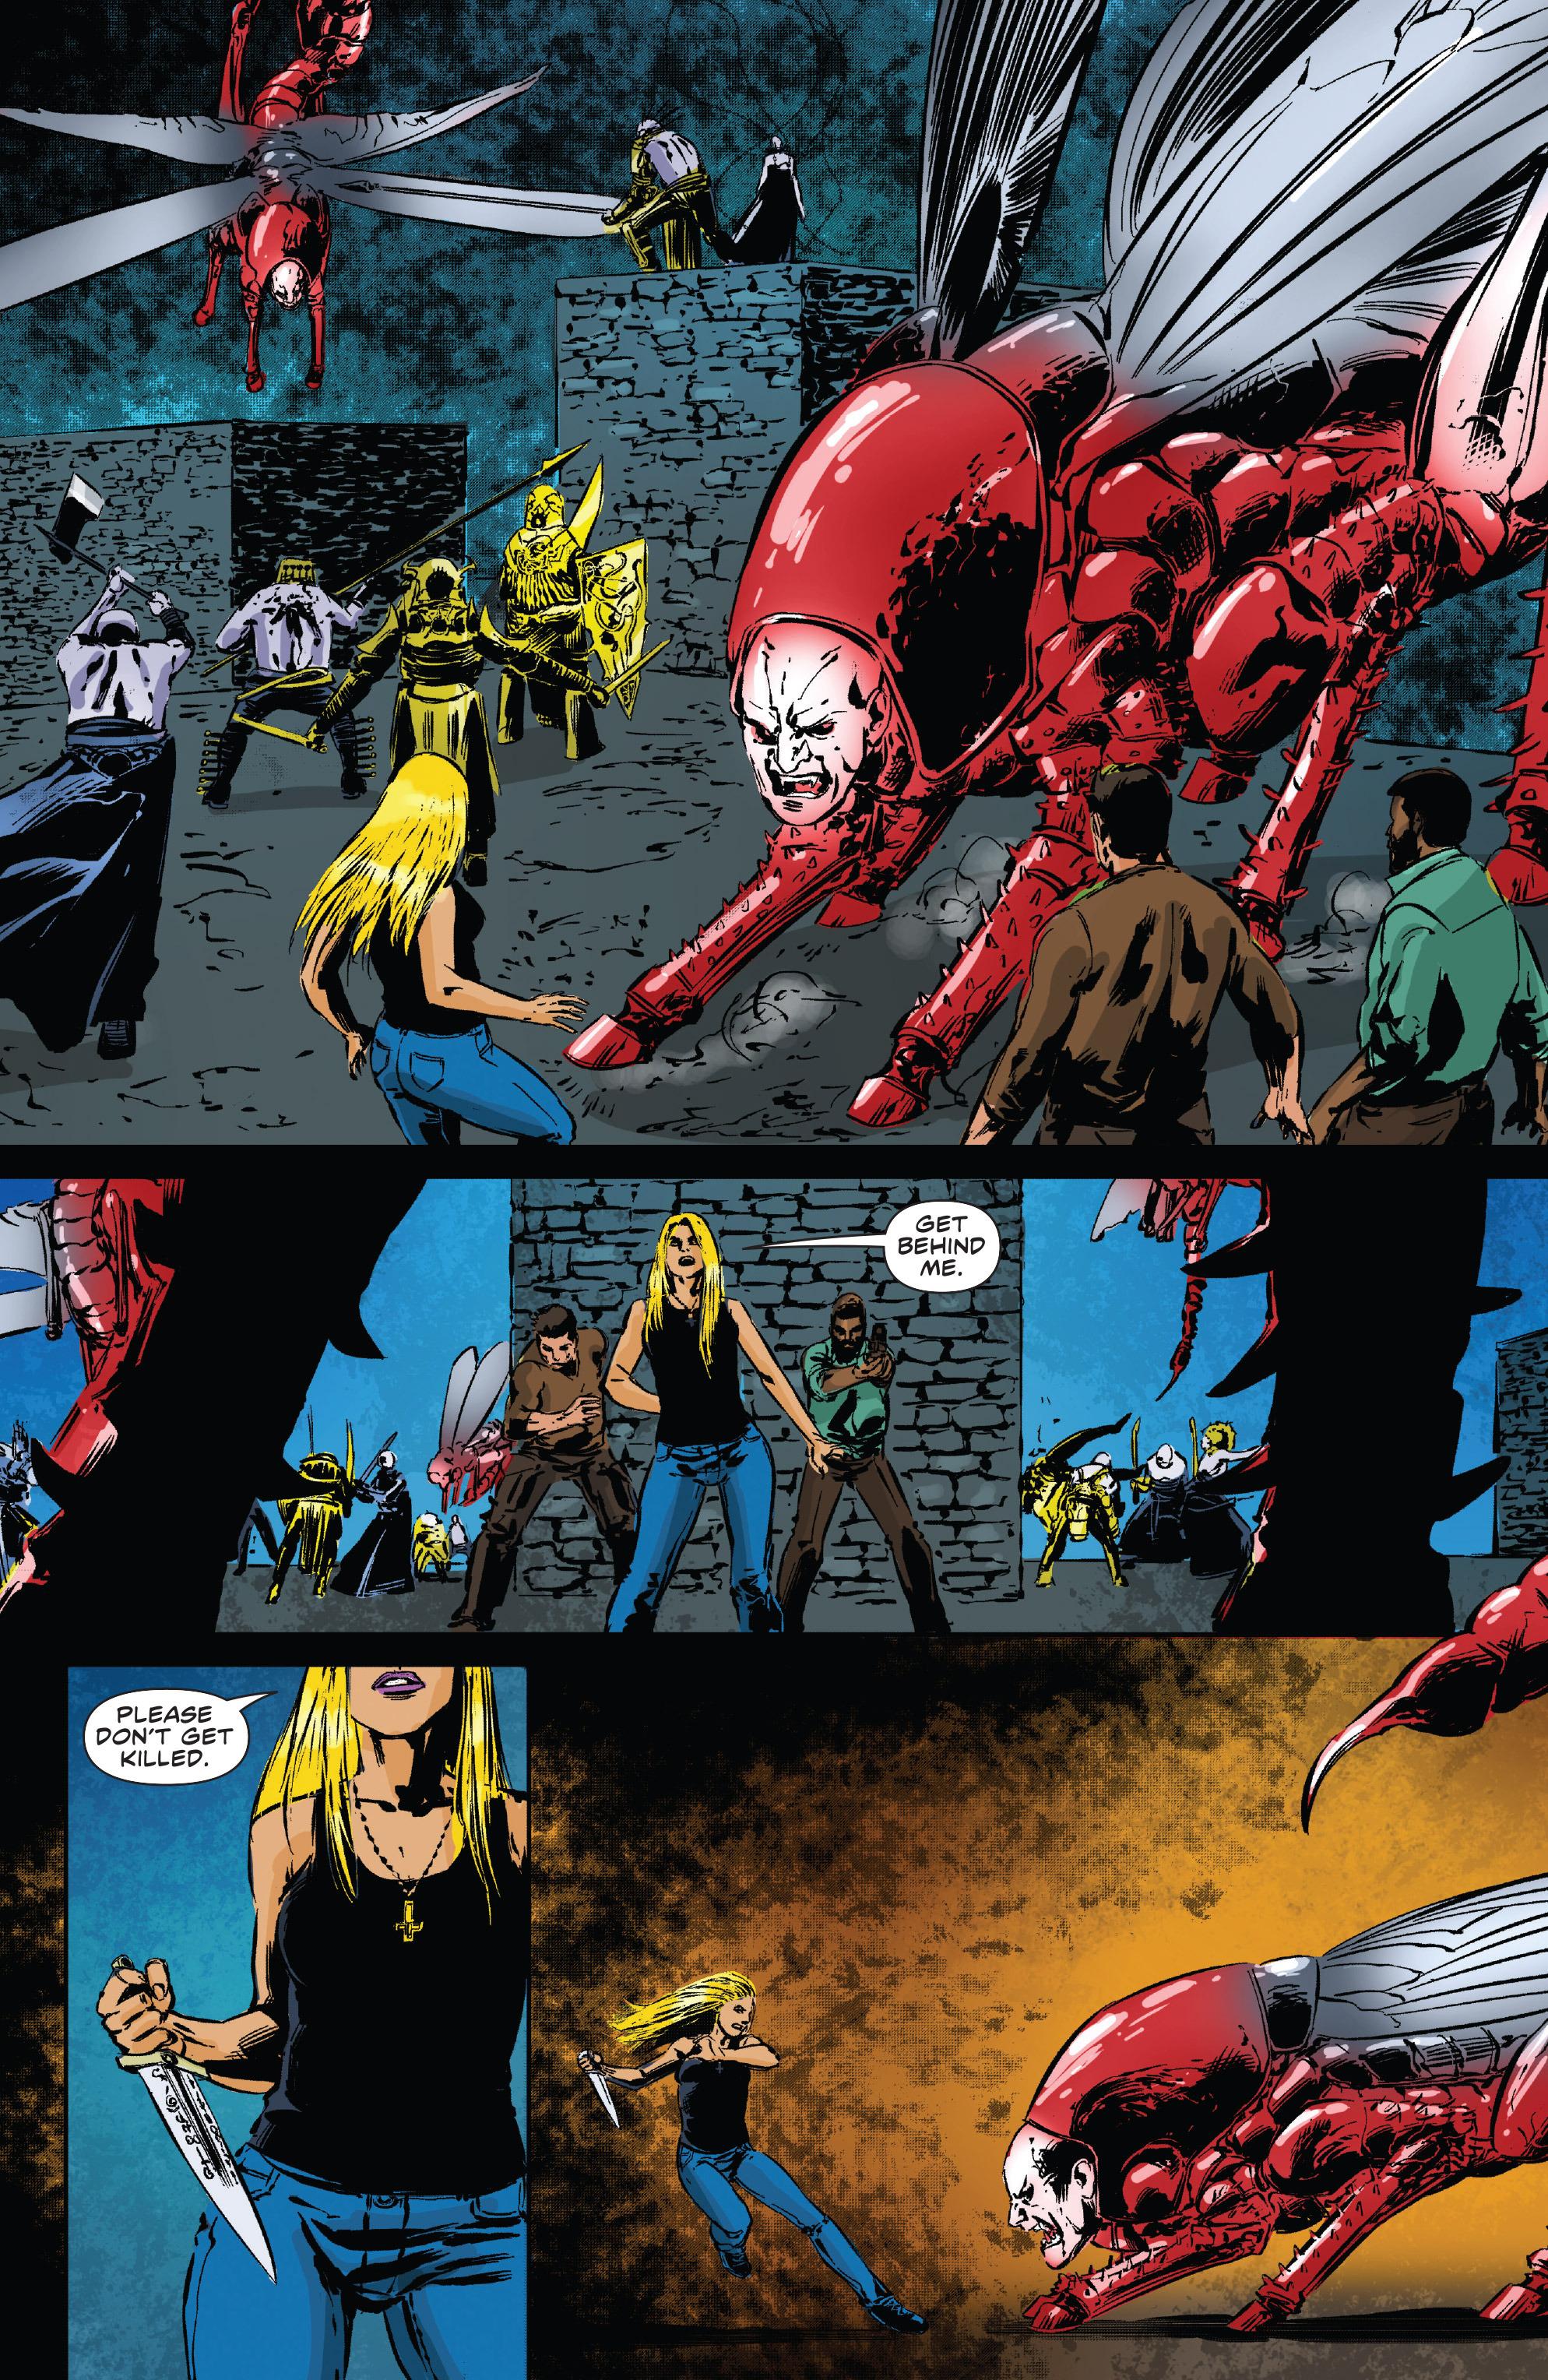 Read online Clive Barker's Hellraiser: The Dark Watch comic -  Issue # TPB 3 - 49